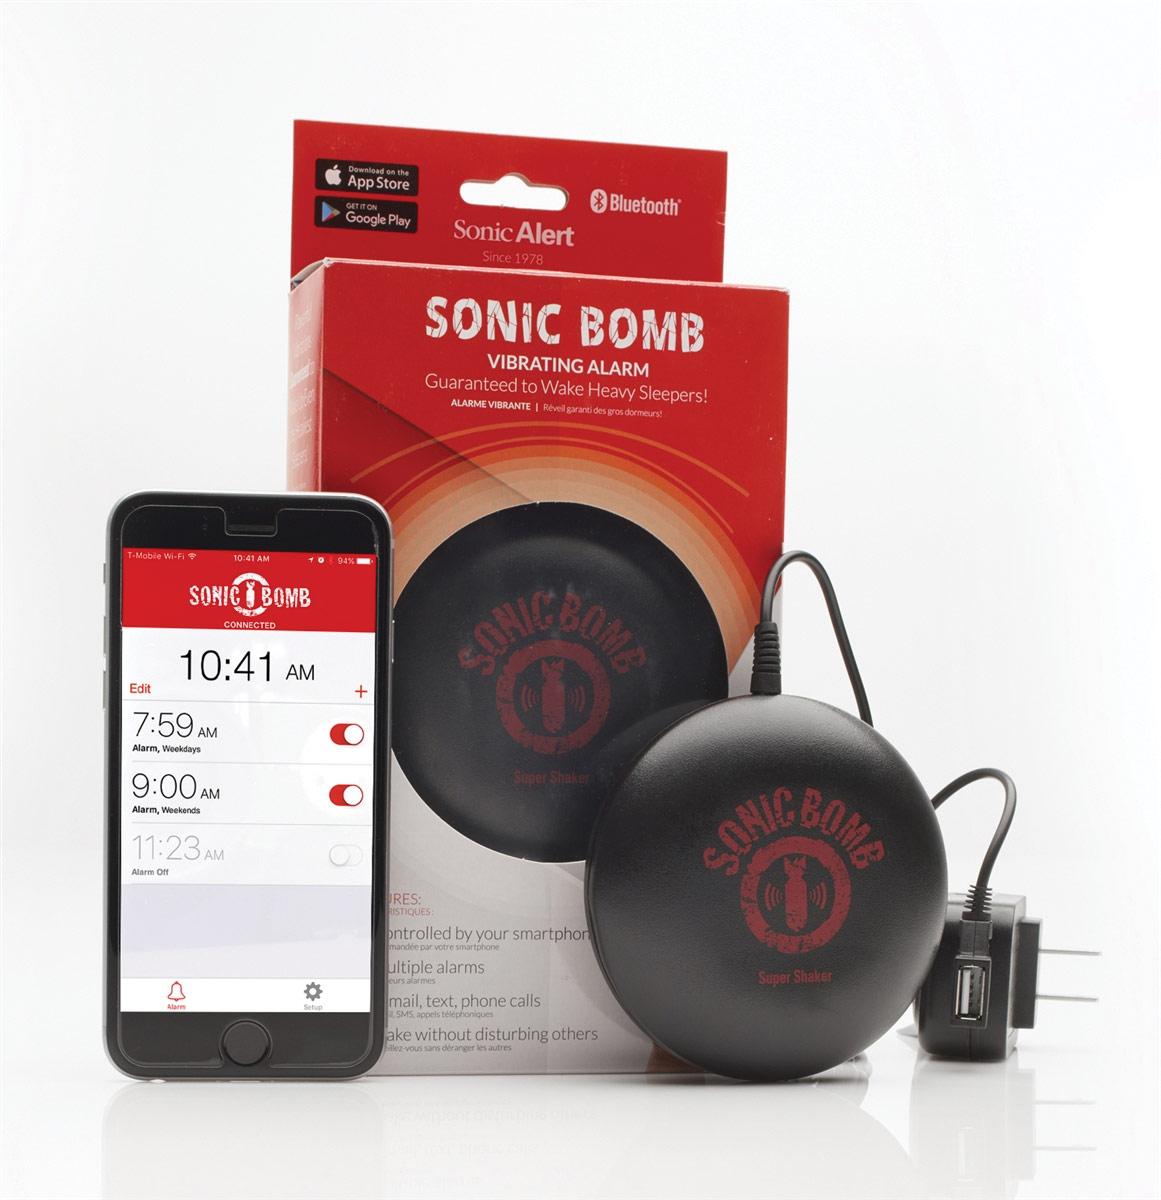 Sonic Bomb Bluetooth Super Shaker Vibrating Alarm - AC-Powered